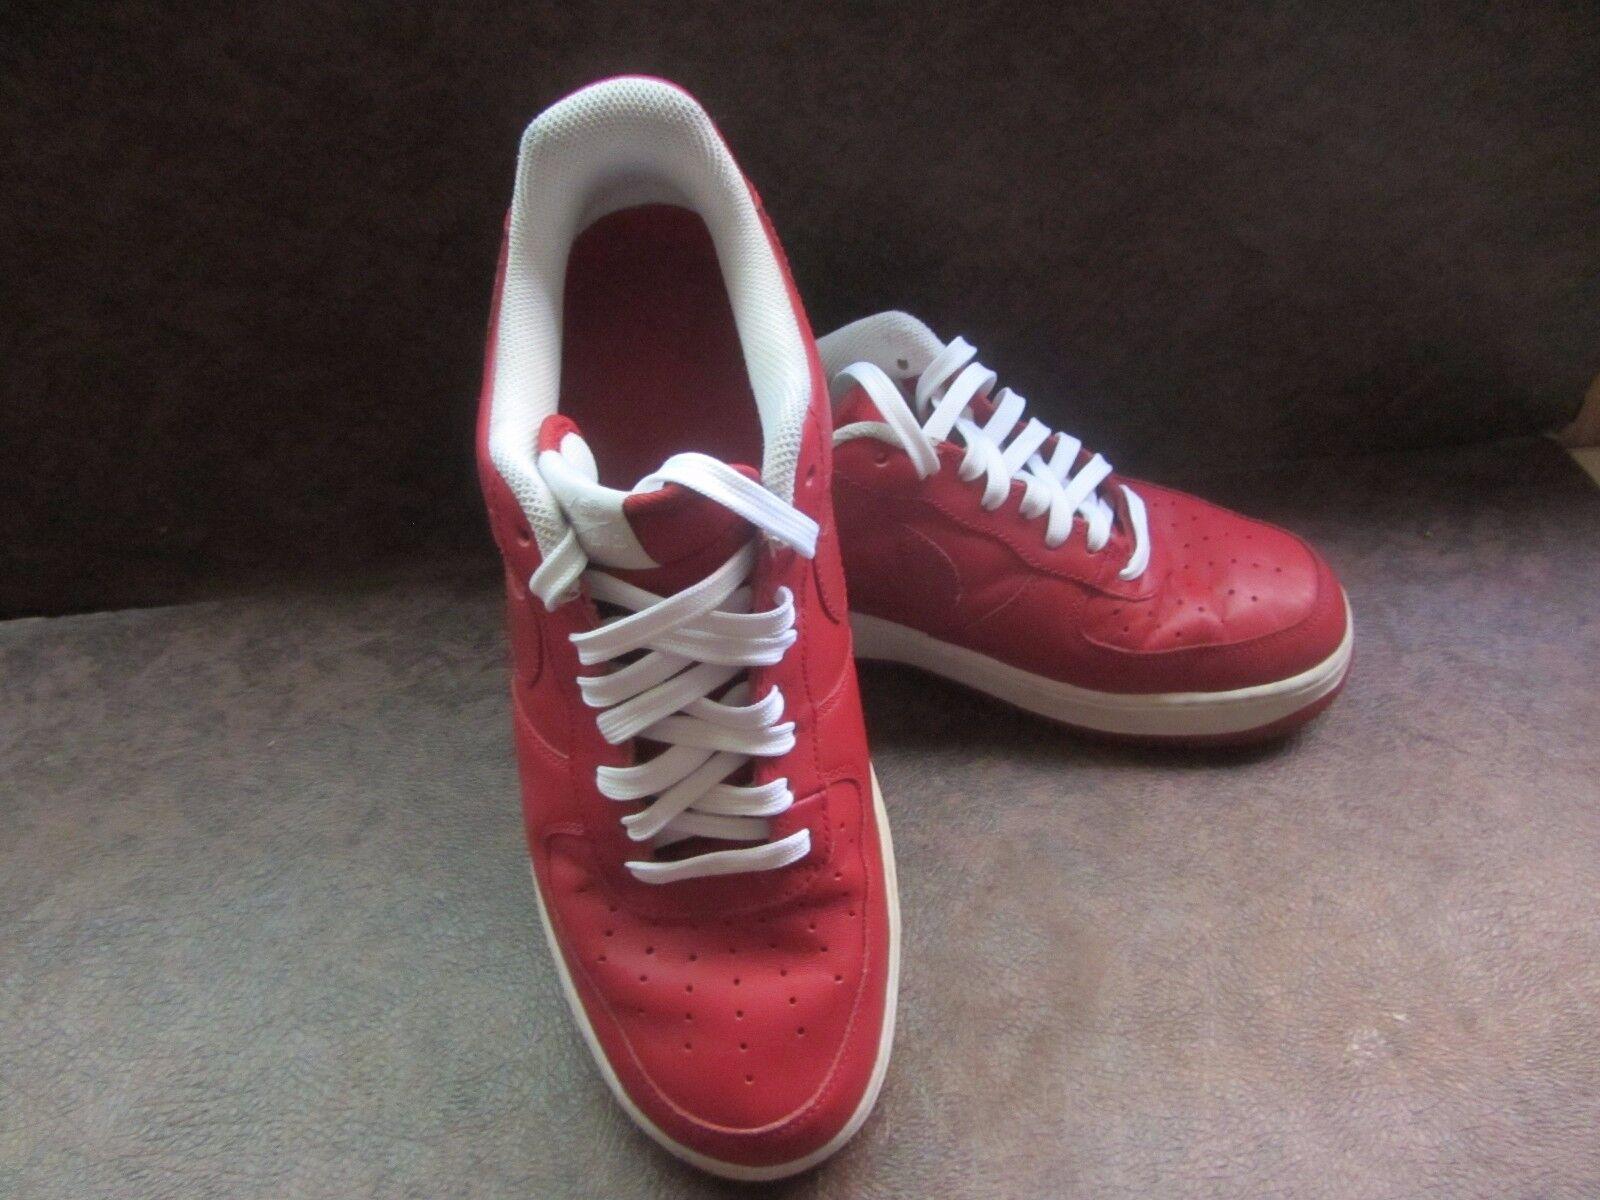 Uomini, edizione limitata di nike air force 1 e scarpe di pelle rossa e 1 scarpe da ginnastica numero 9 8b52a1